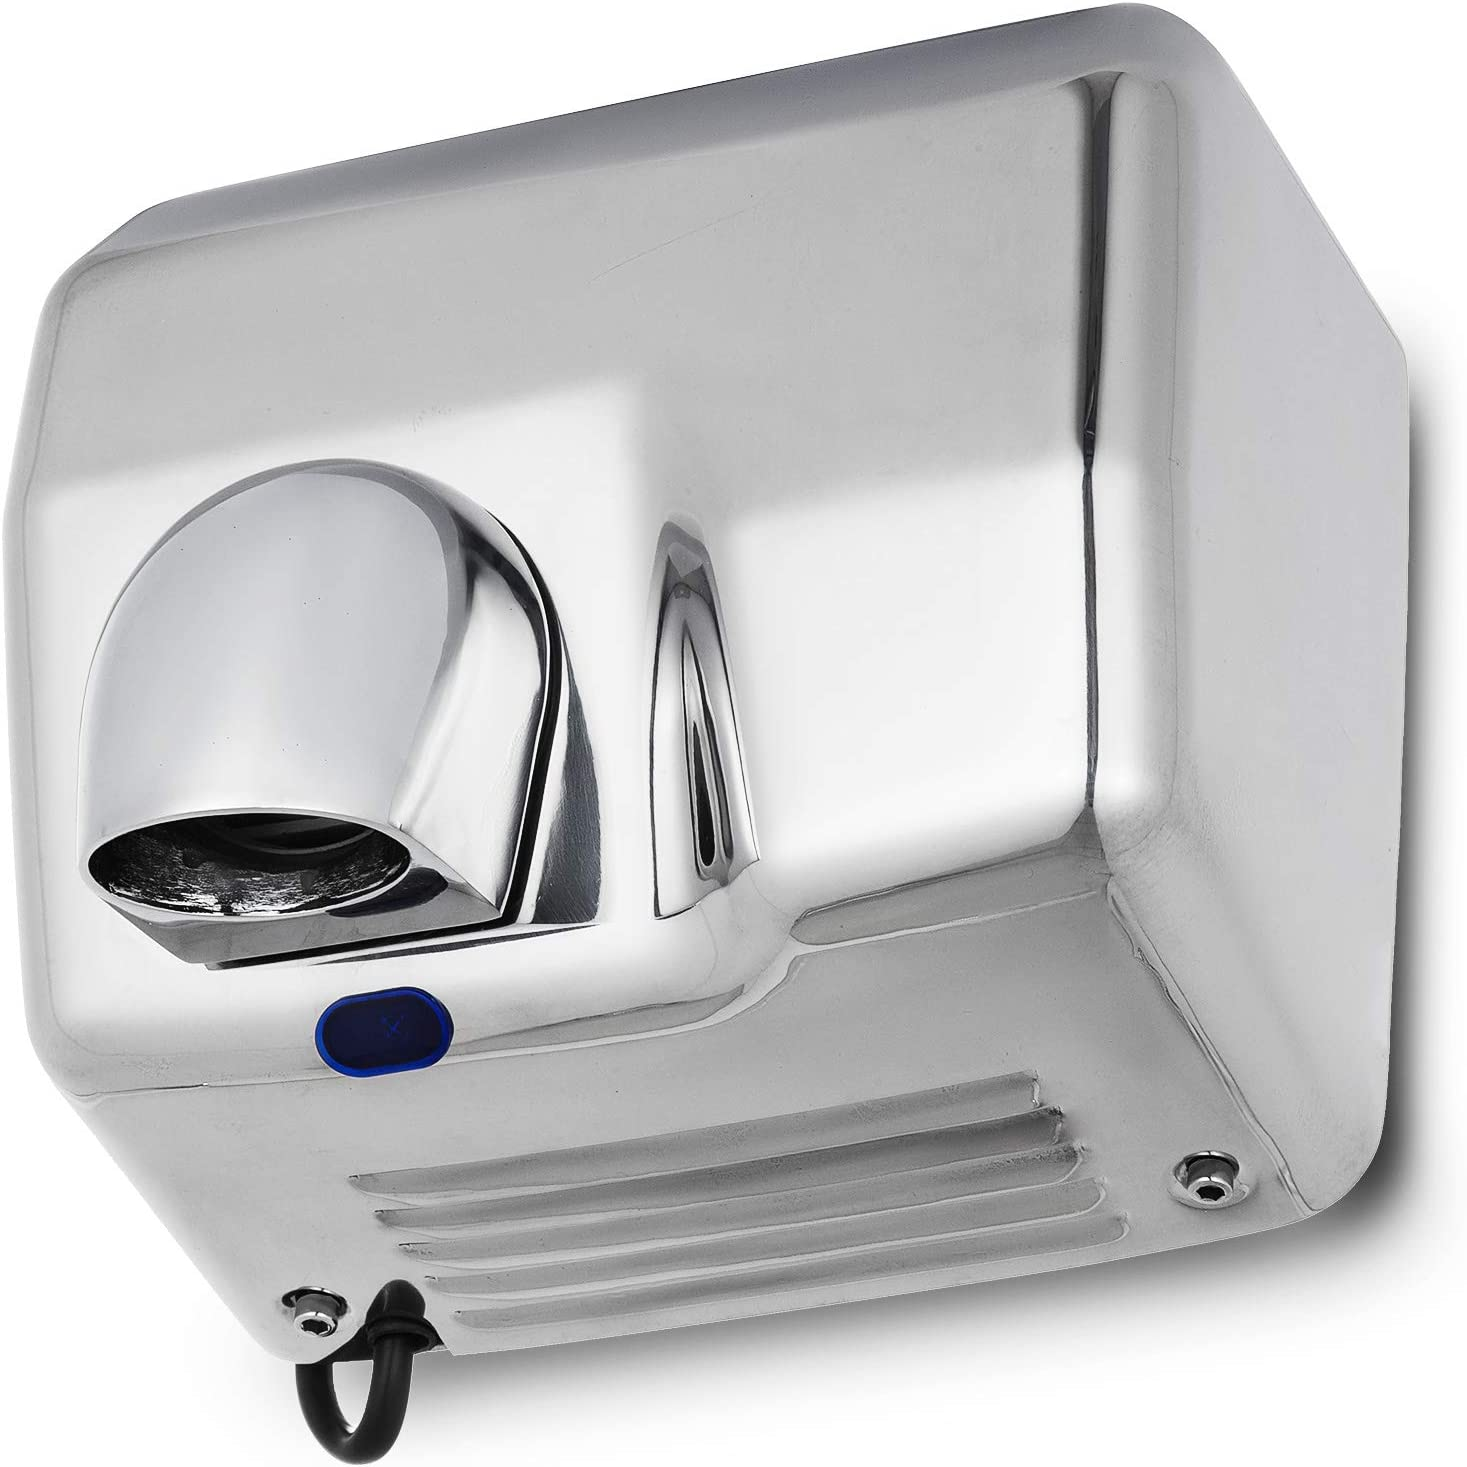 Cueffer Secador de Manos Secador de Manos Electrico Secador de Manos Automatico de Acero Inoxidable Secadora de Manos Comercial Secador de Aire Fuerza Hand Dryers 2500W